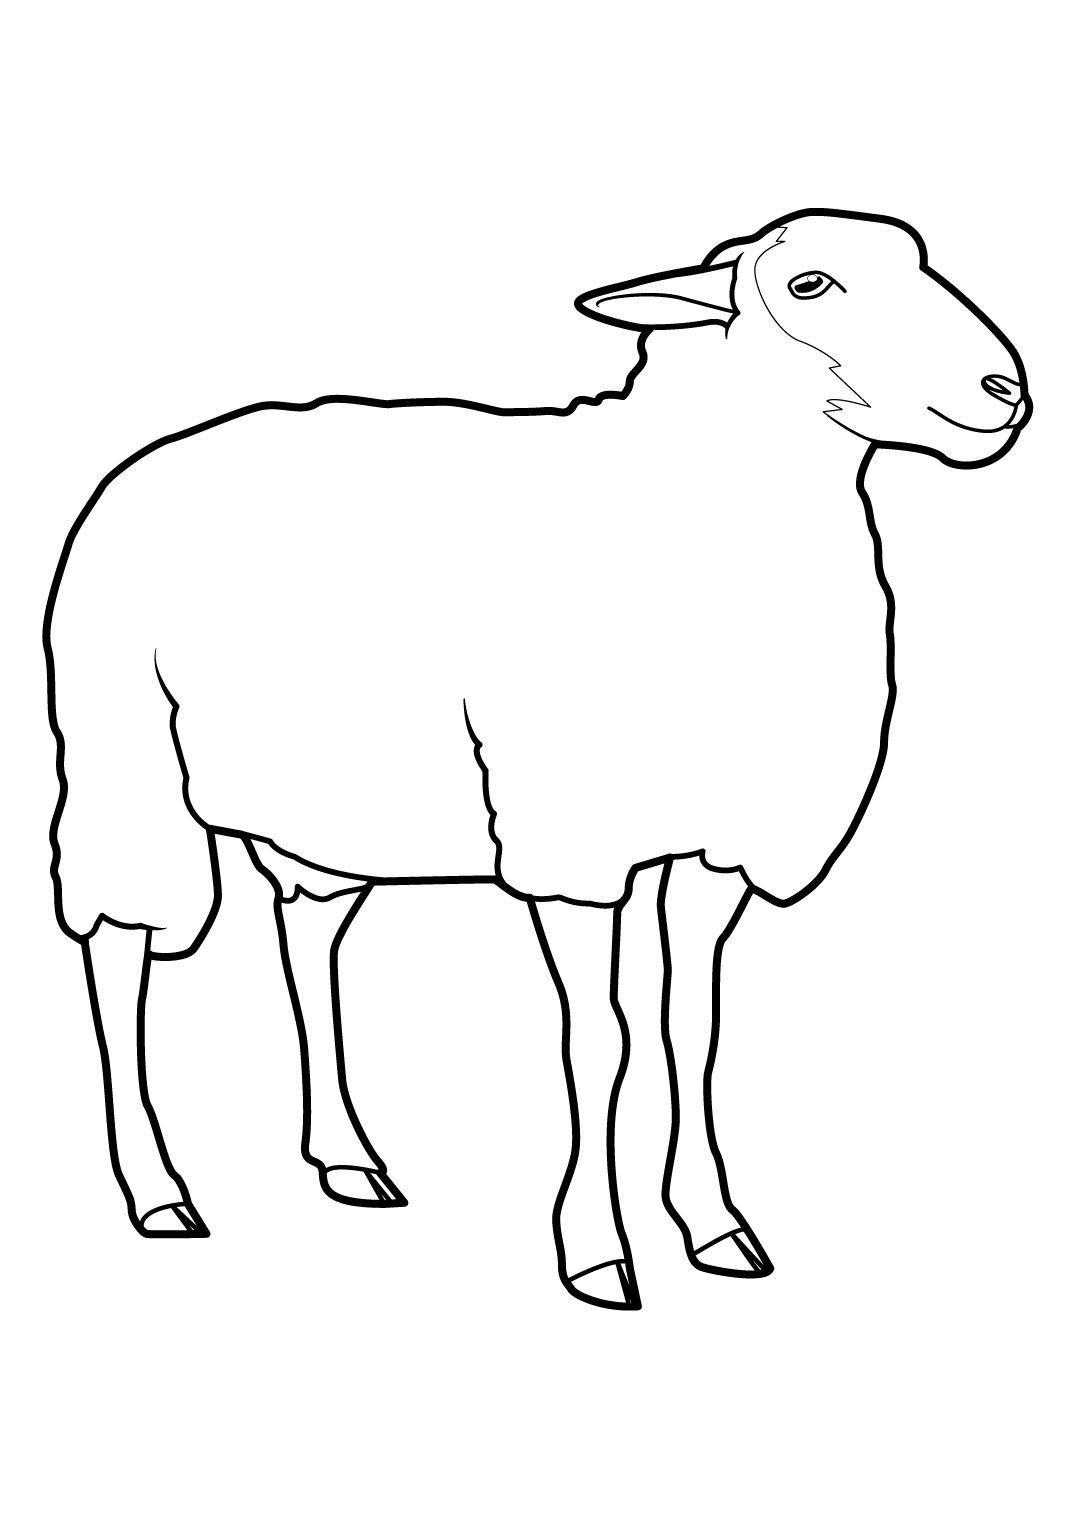 Coloriage Mouton 7 Coloriage Moutons Coloriages Animaux